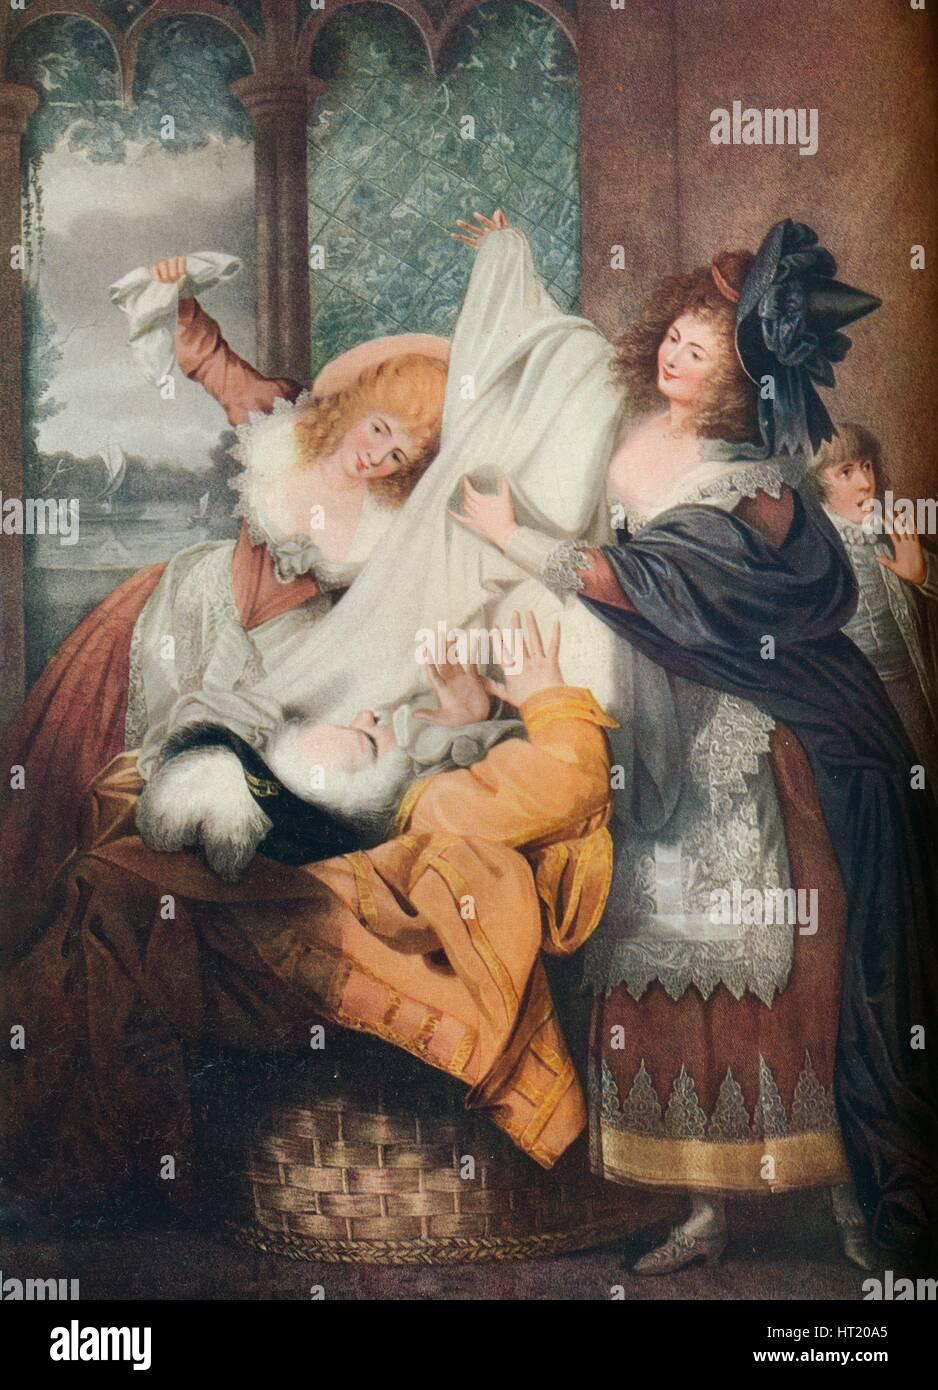 """Lustigen Weiber von Windsor: Akt III, Szene III"", c18th Jahrhundert. Künstler: IP-Simon Stockbild"